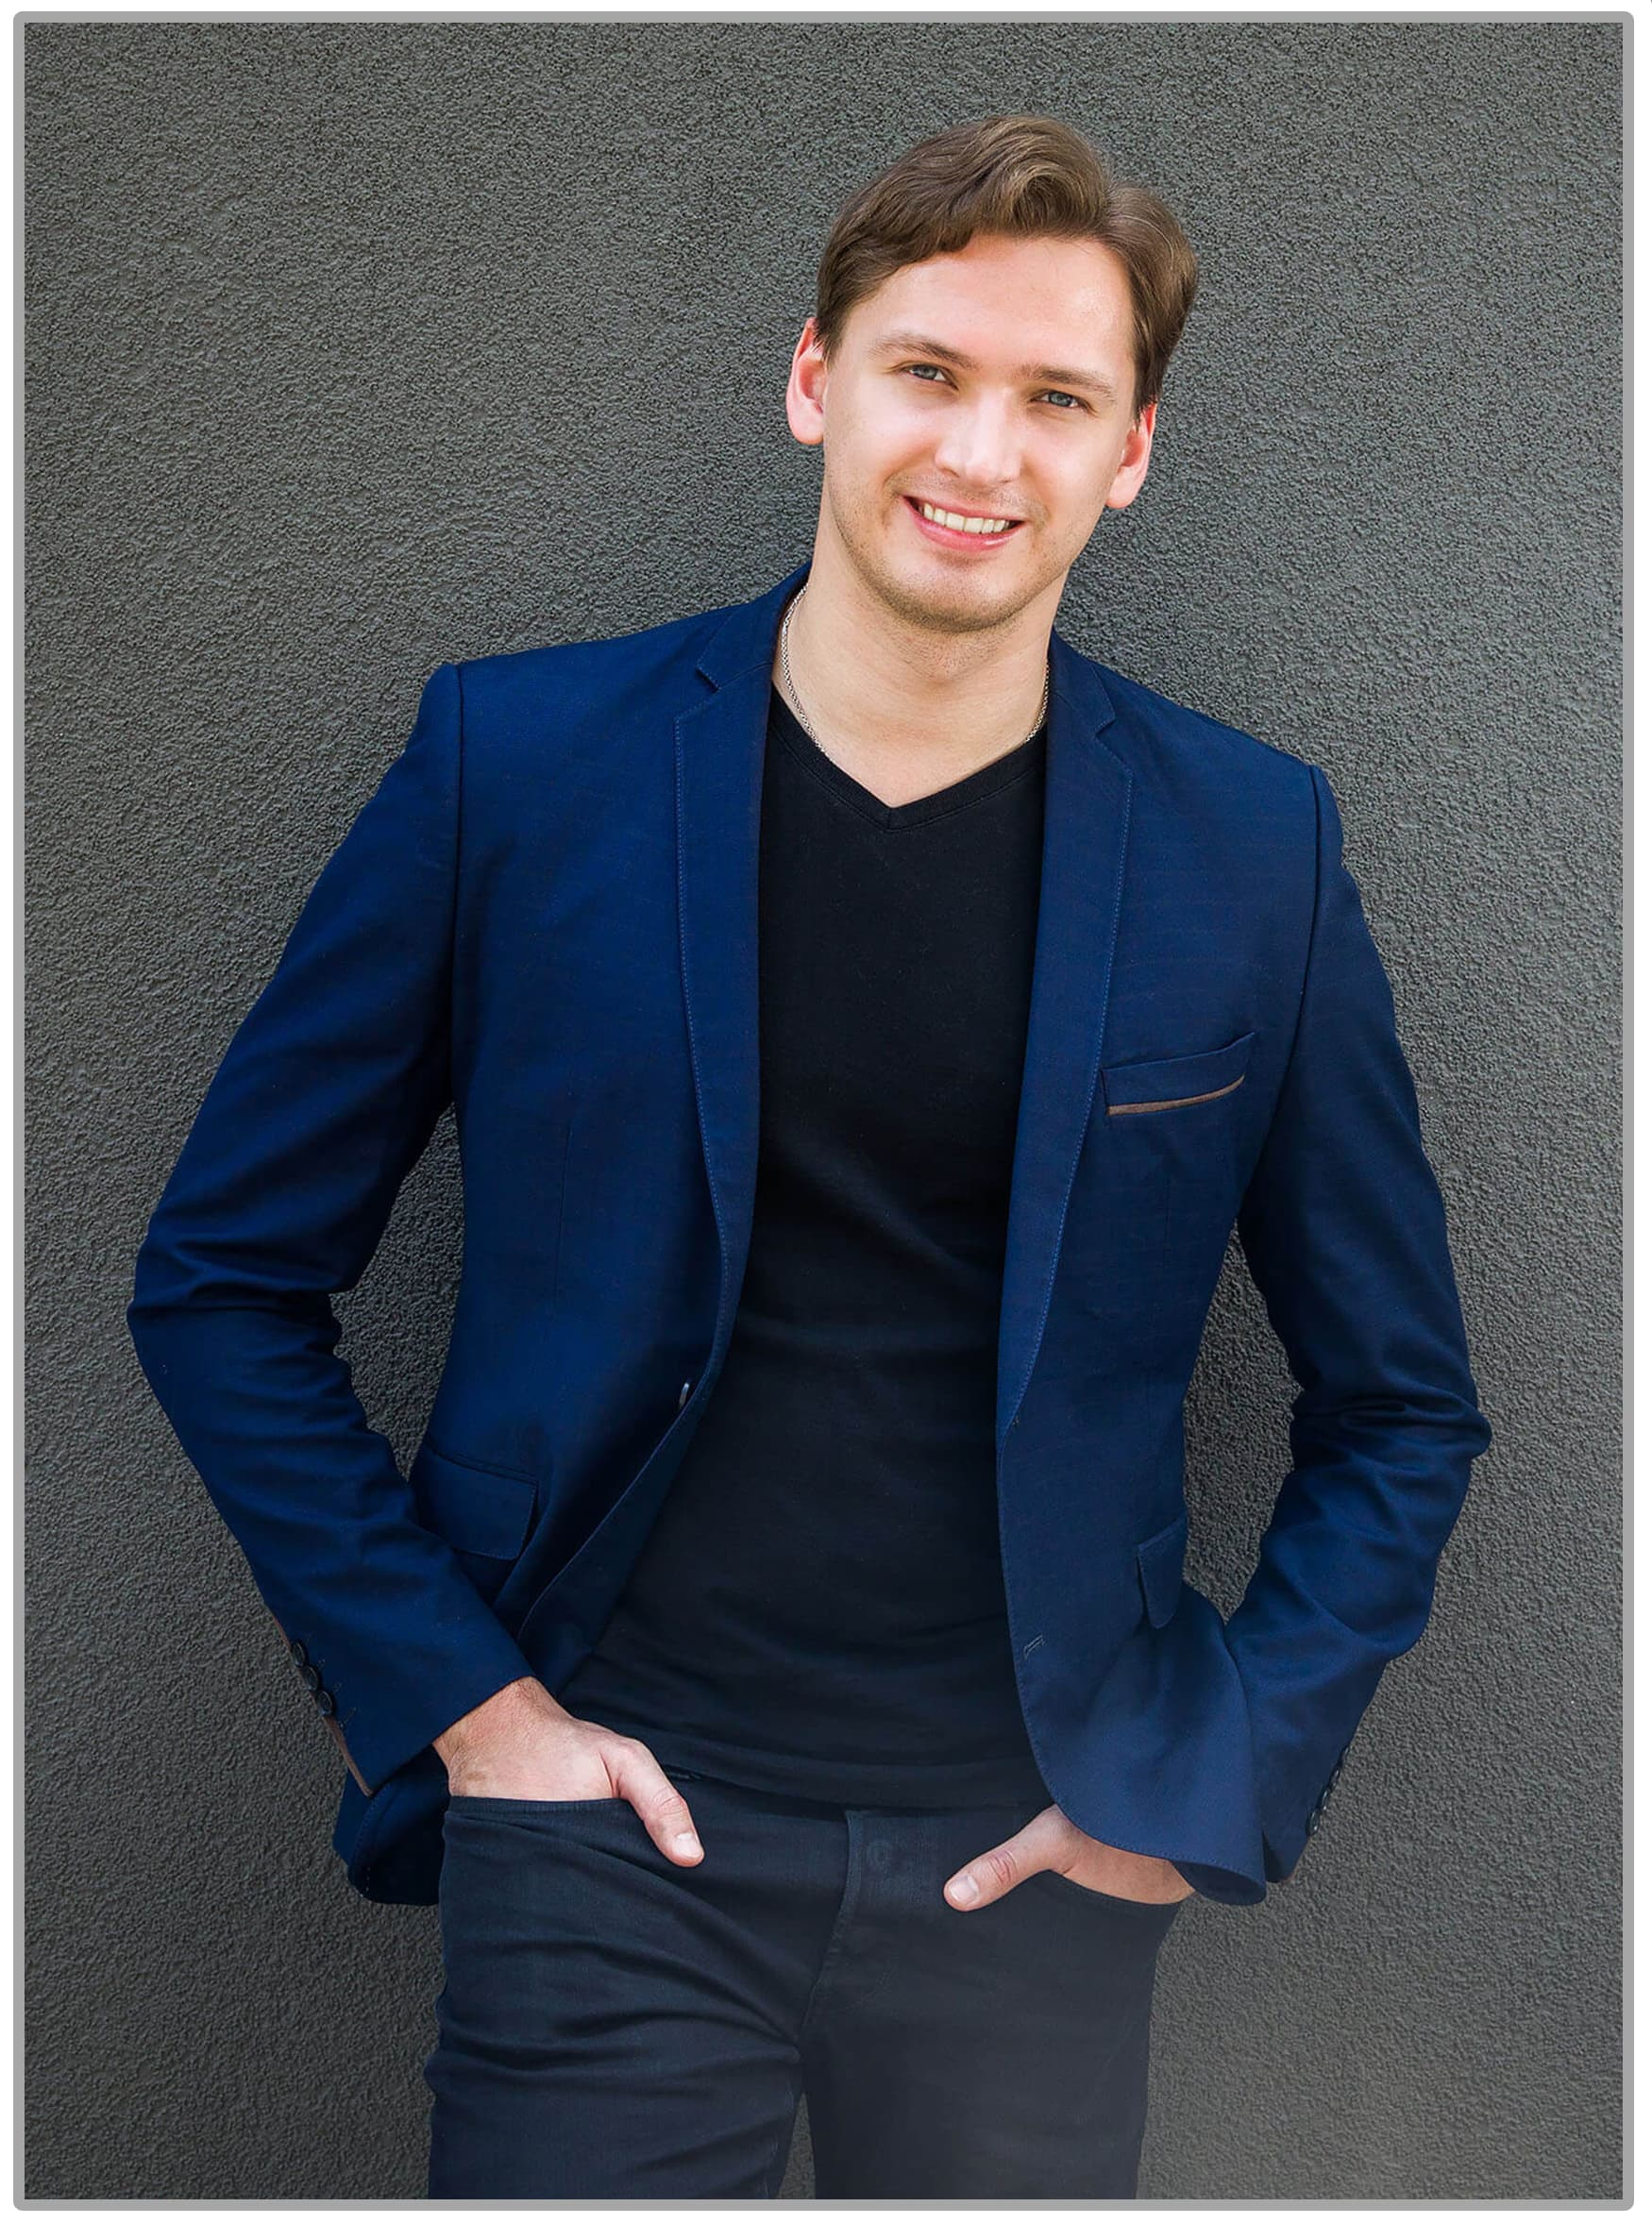 Dāvis Siksnāns Interview Printful CEO